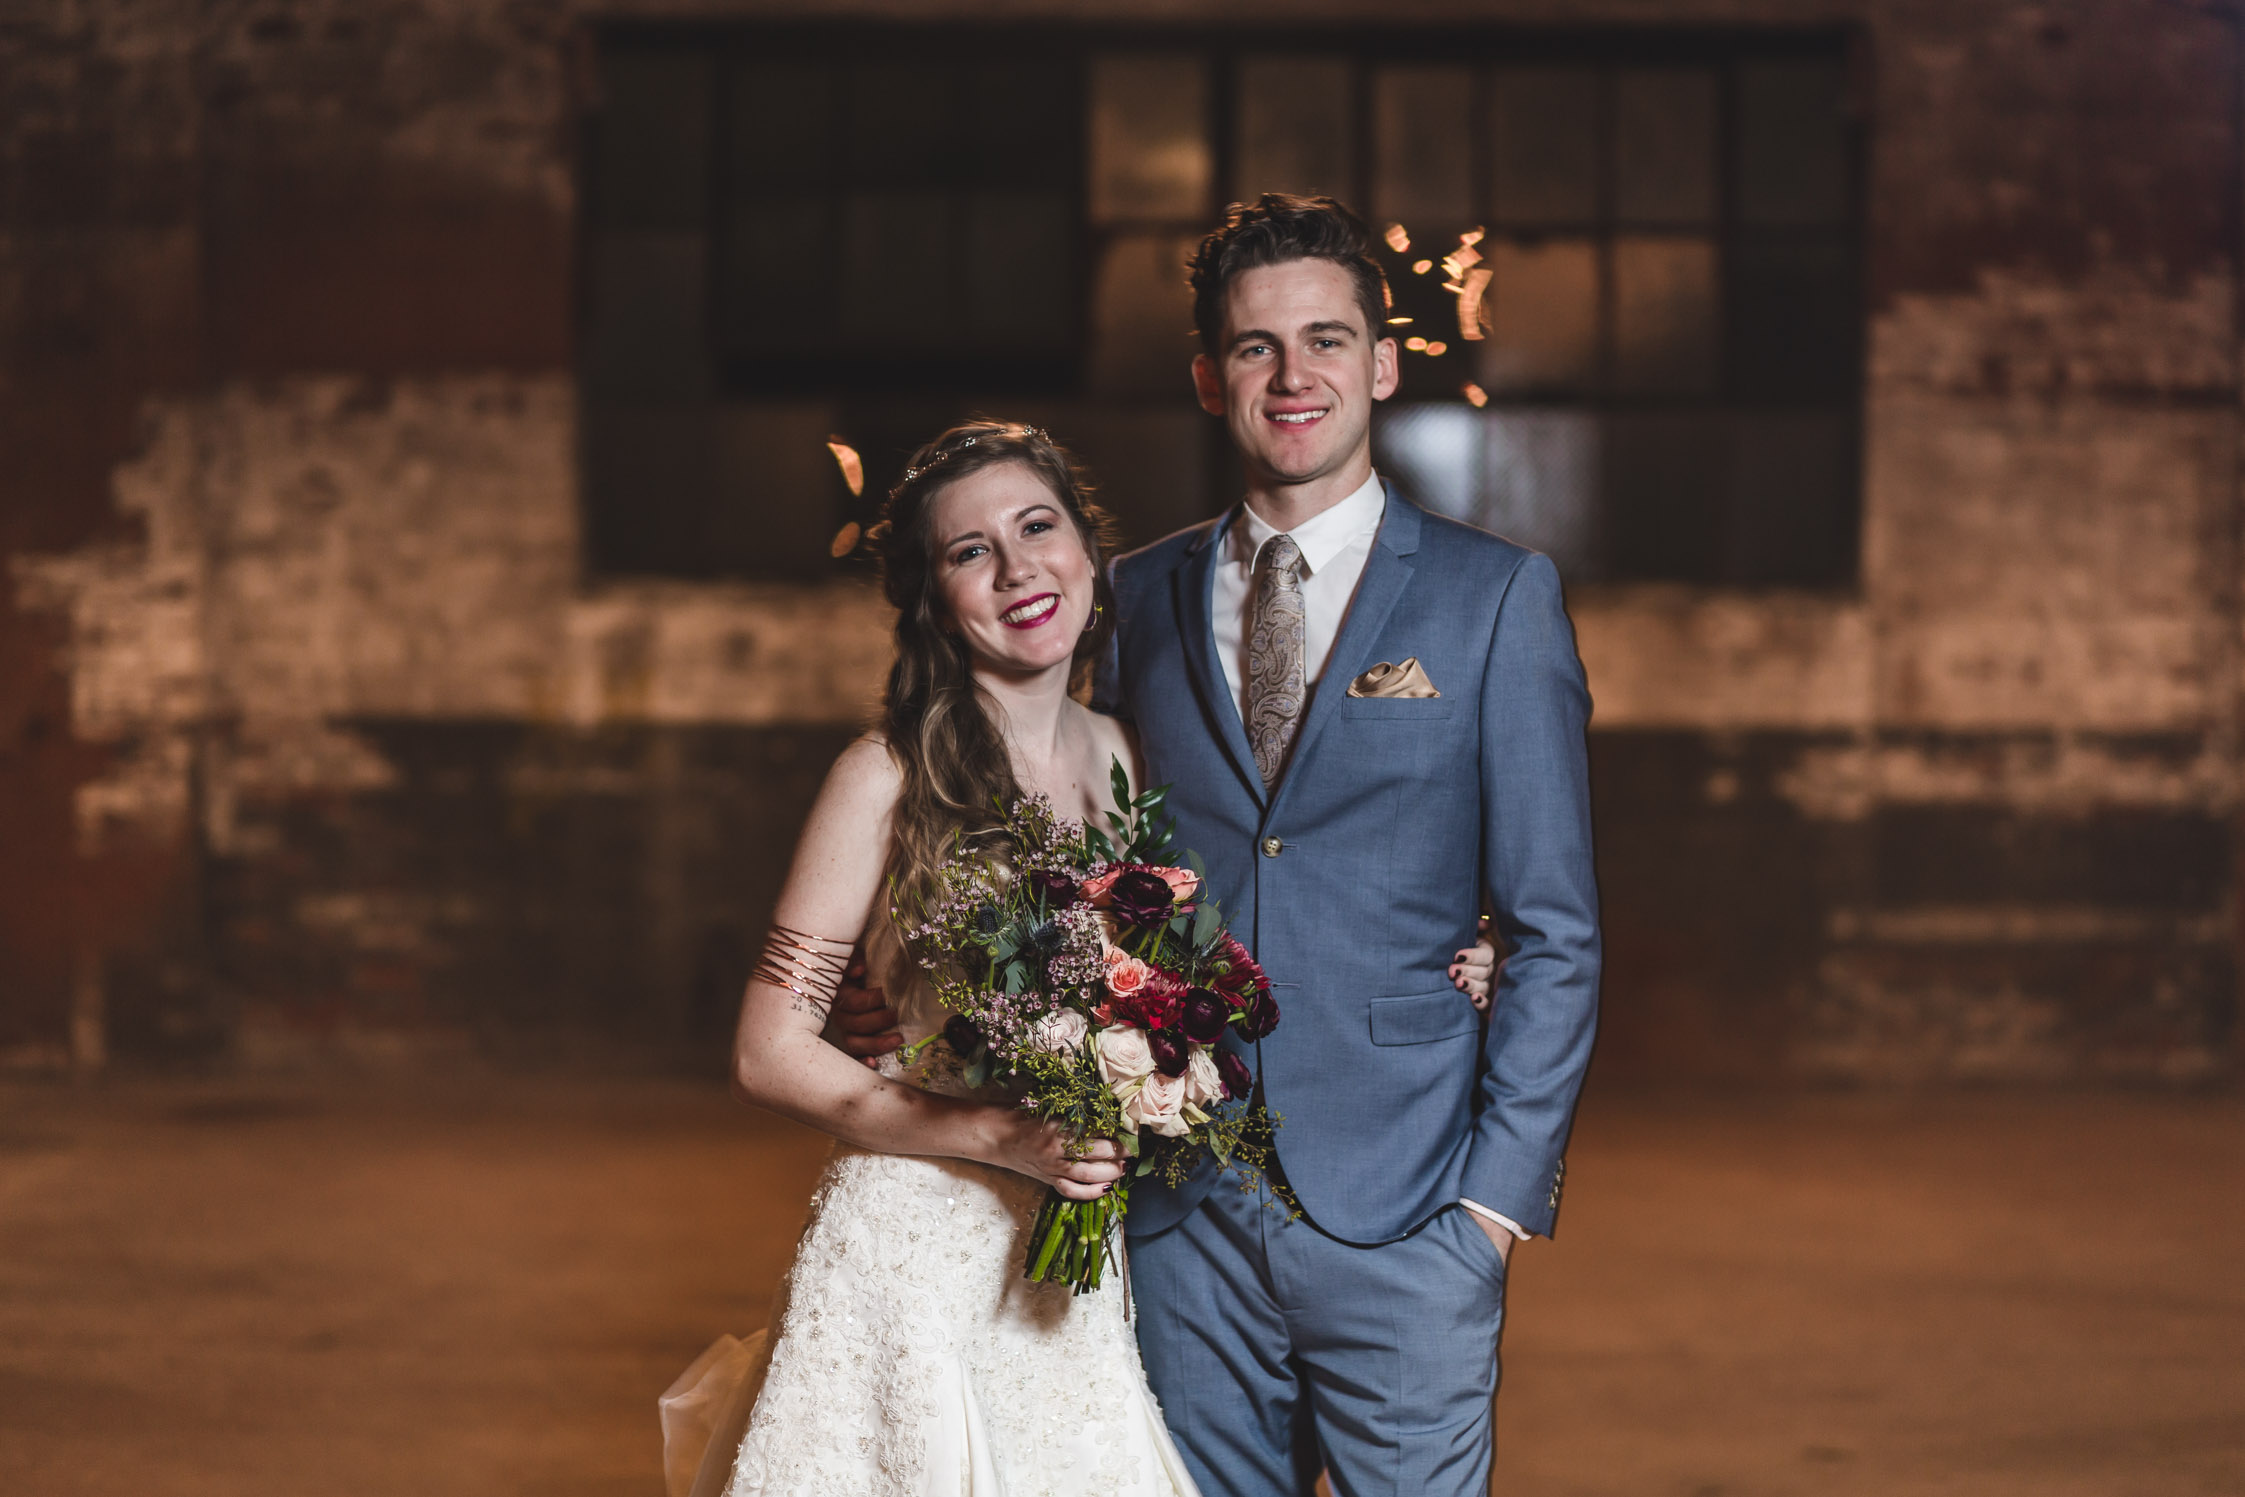 Adam-Szrmack-The-Glass-Factory-Wedding-129.jpg